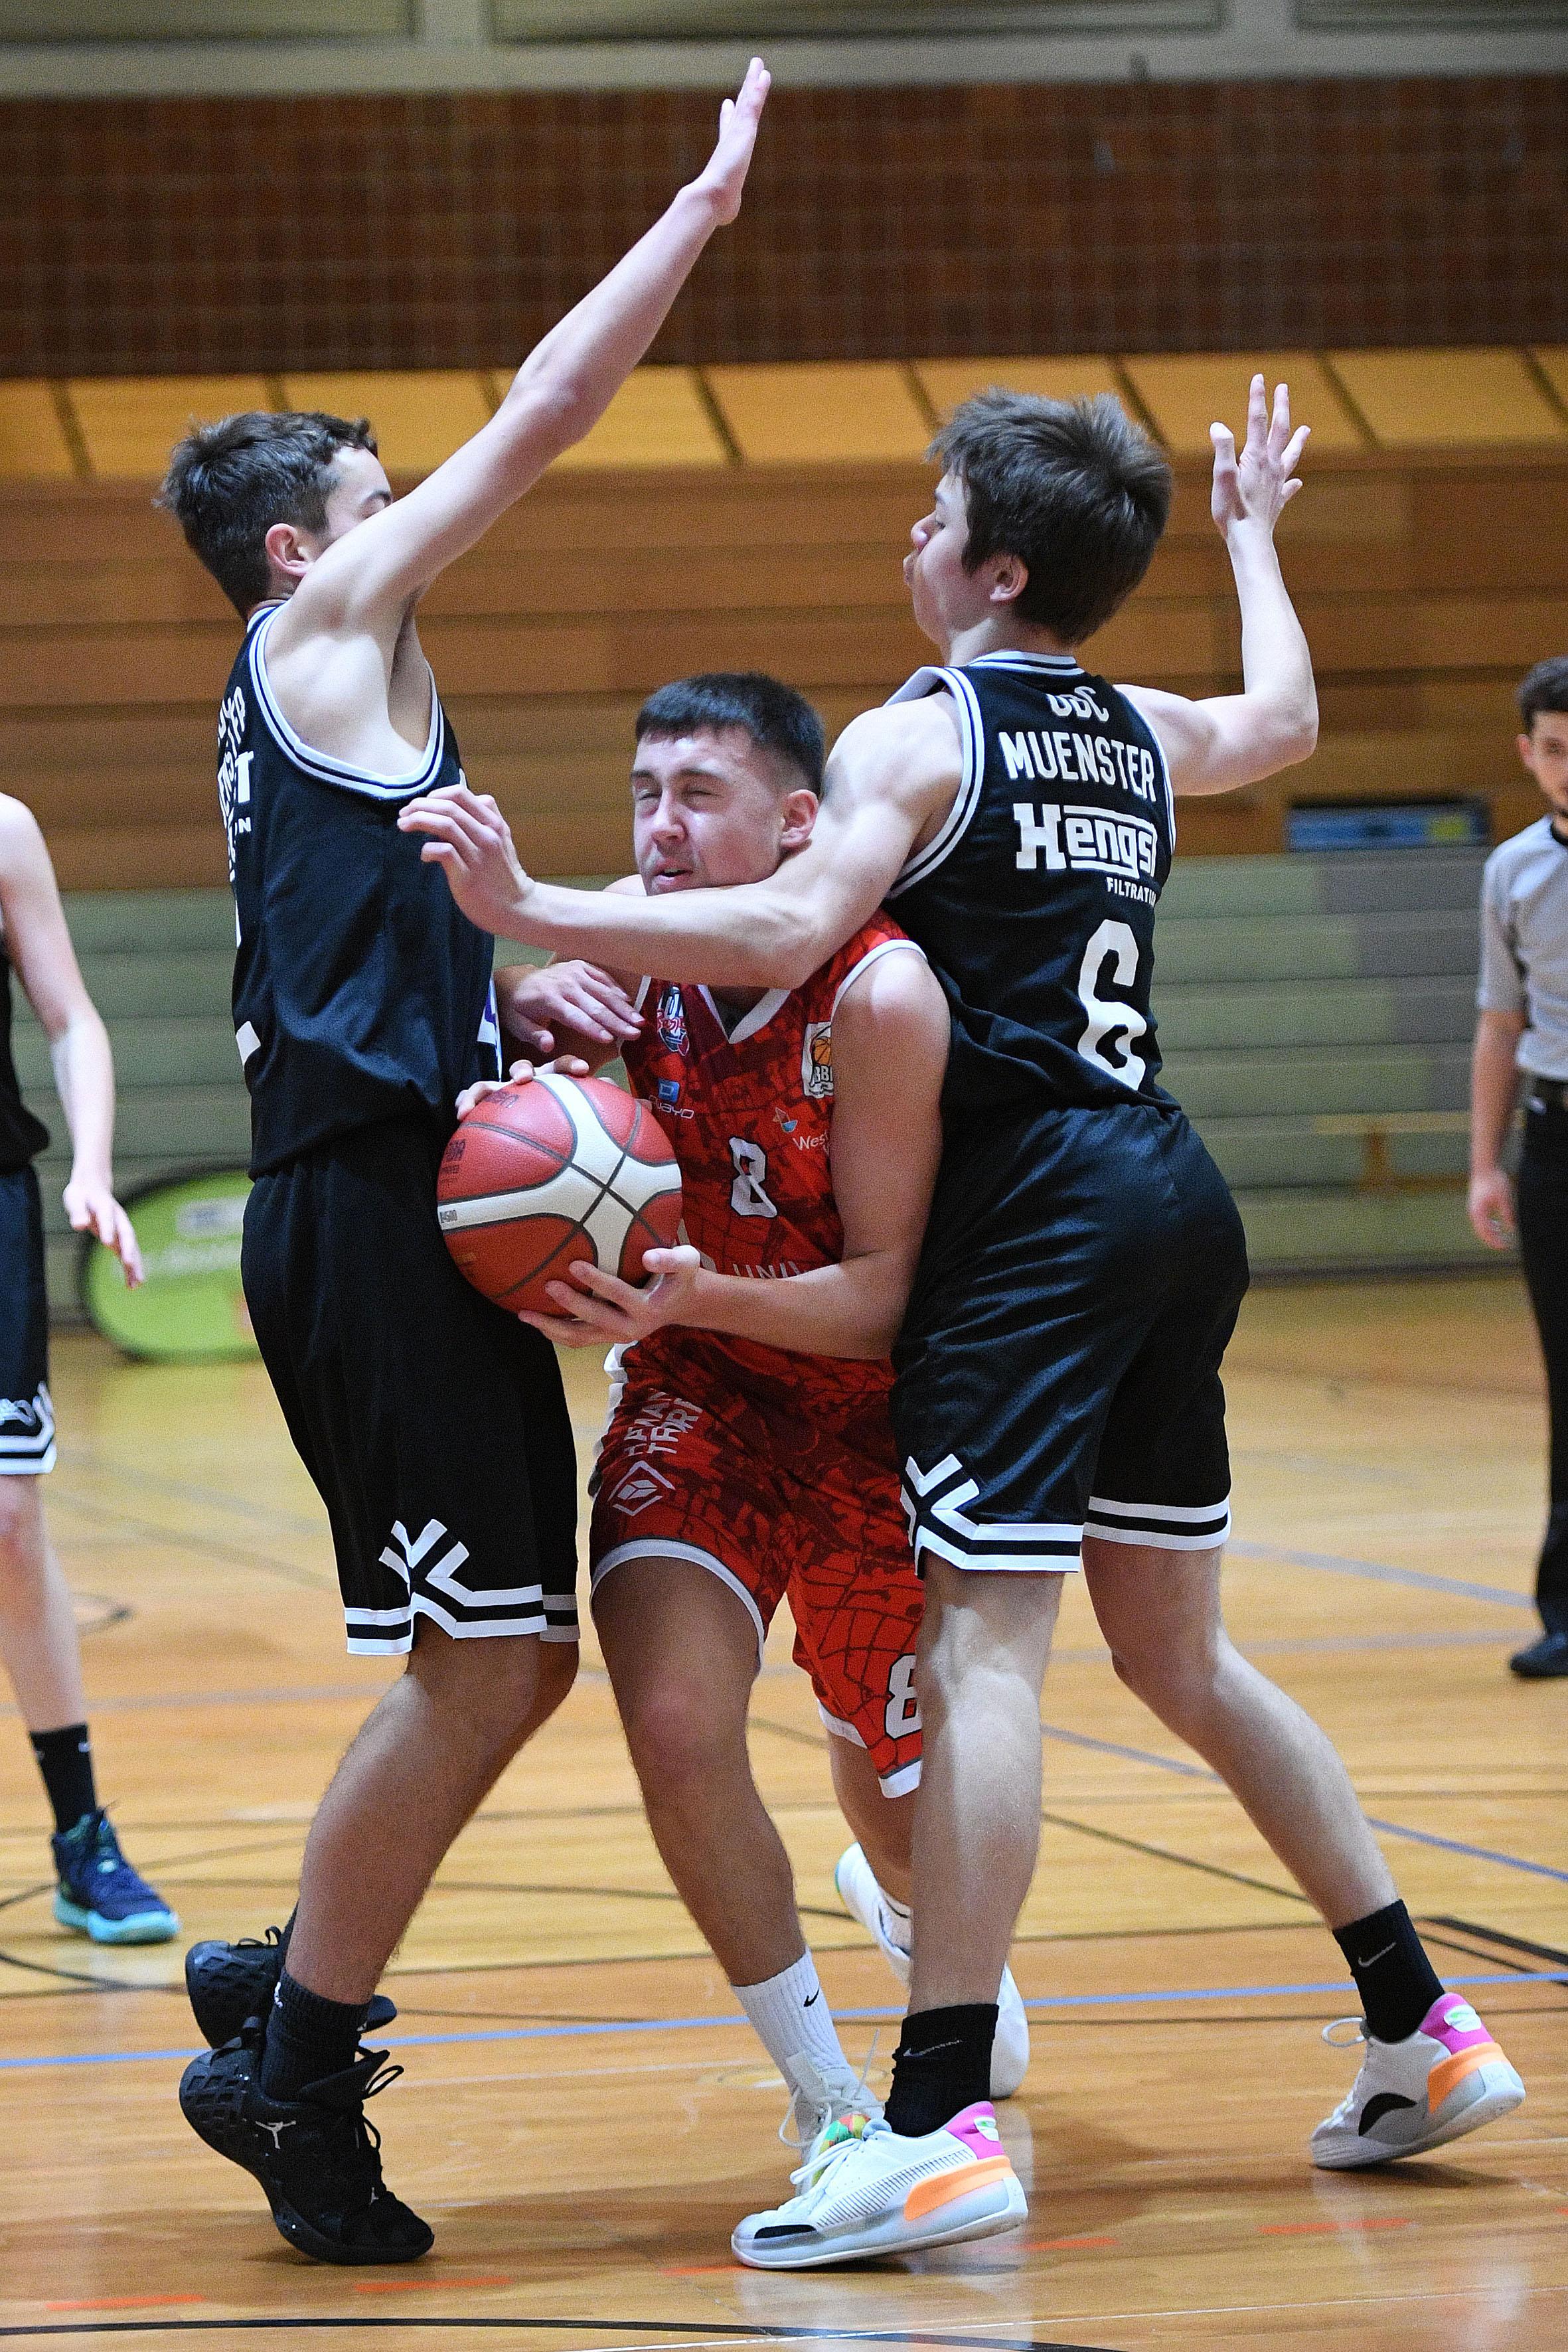 2020-10-18-JBBL-Uni-Baskets-Paderborn-UBC-Muenster_8555